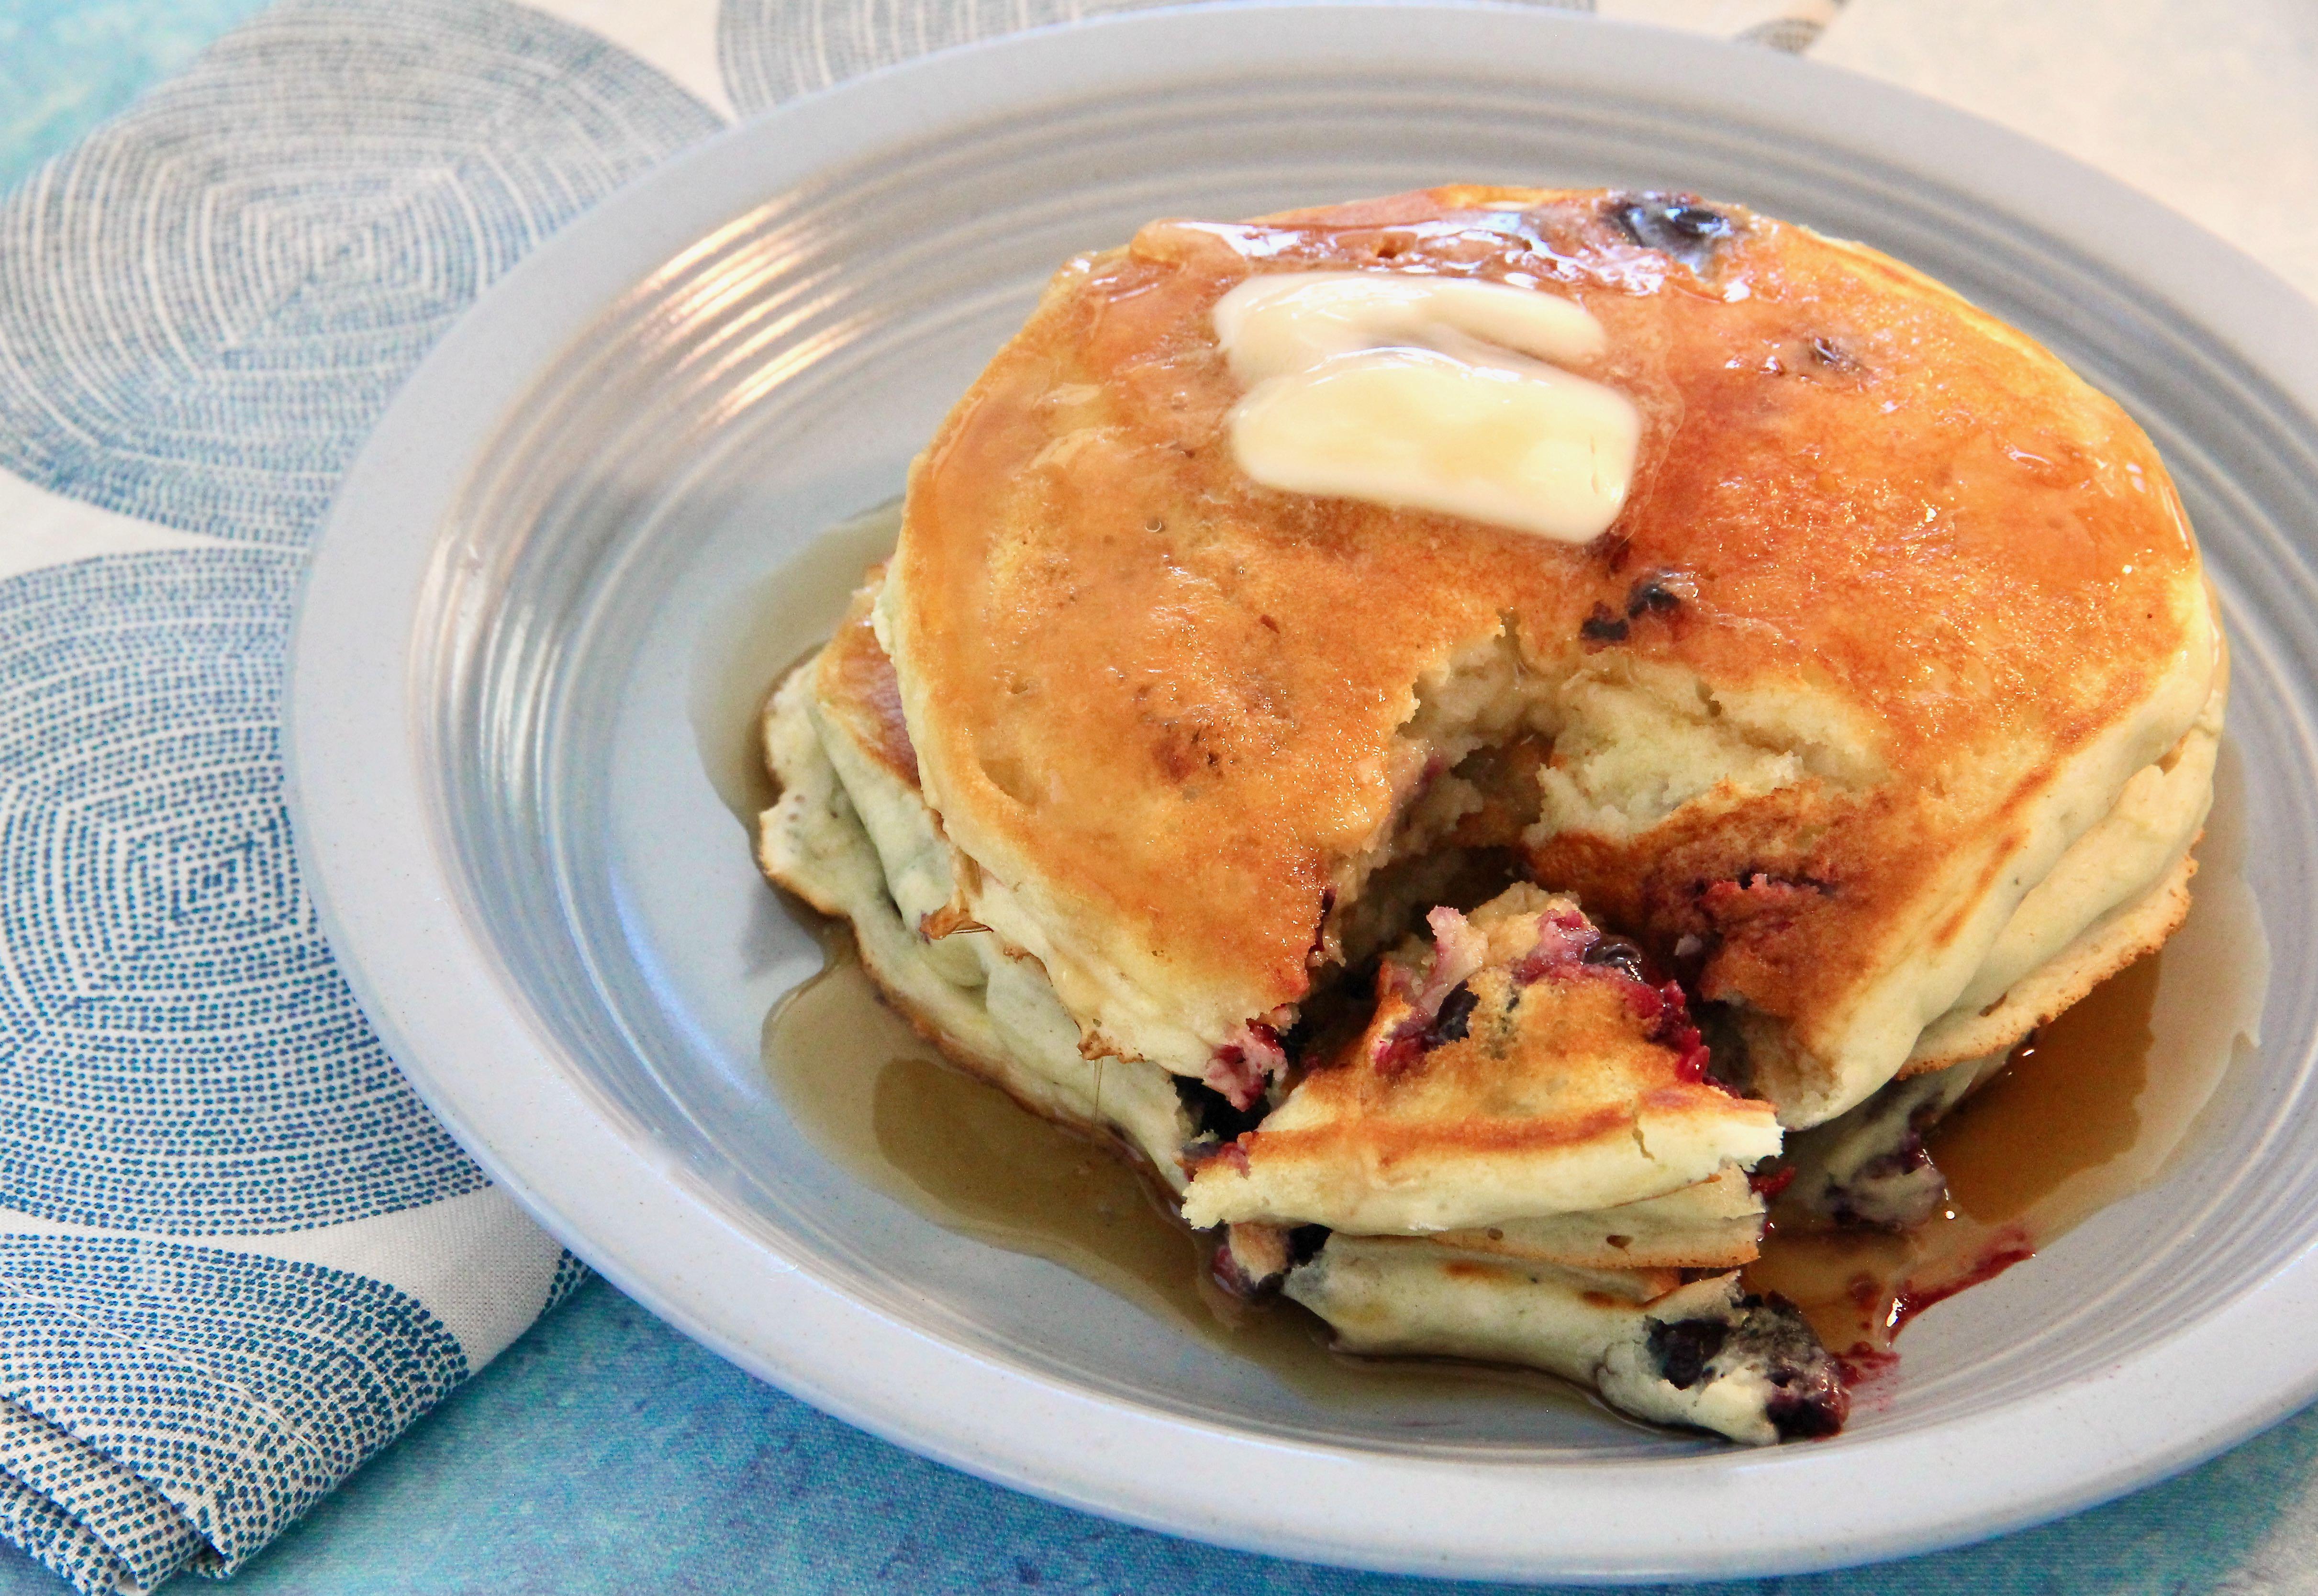 Lemon-Blueberry Pancakes